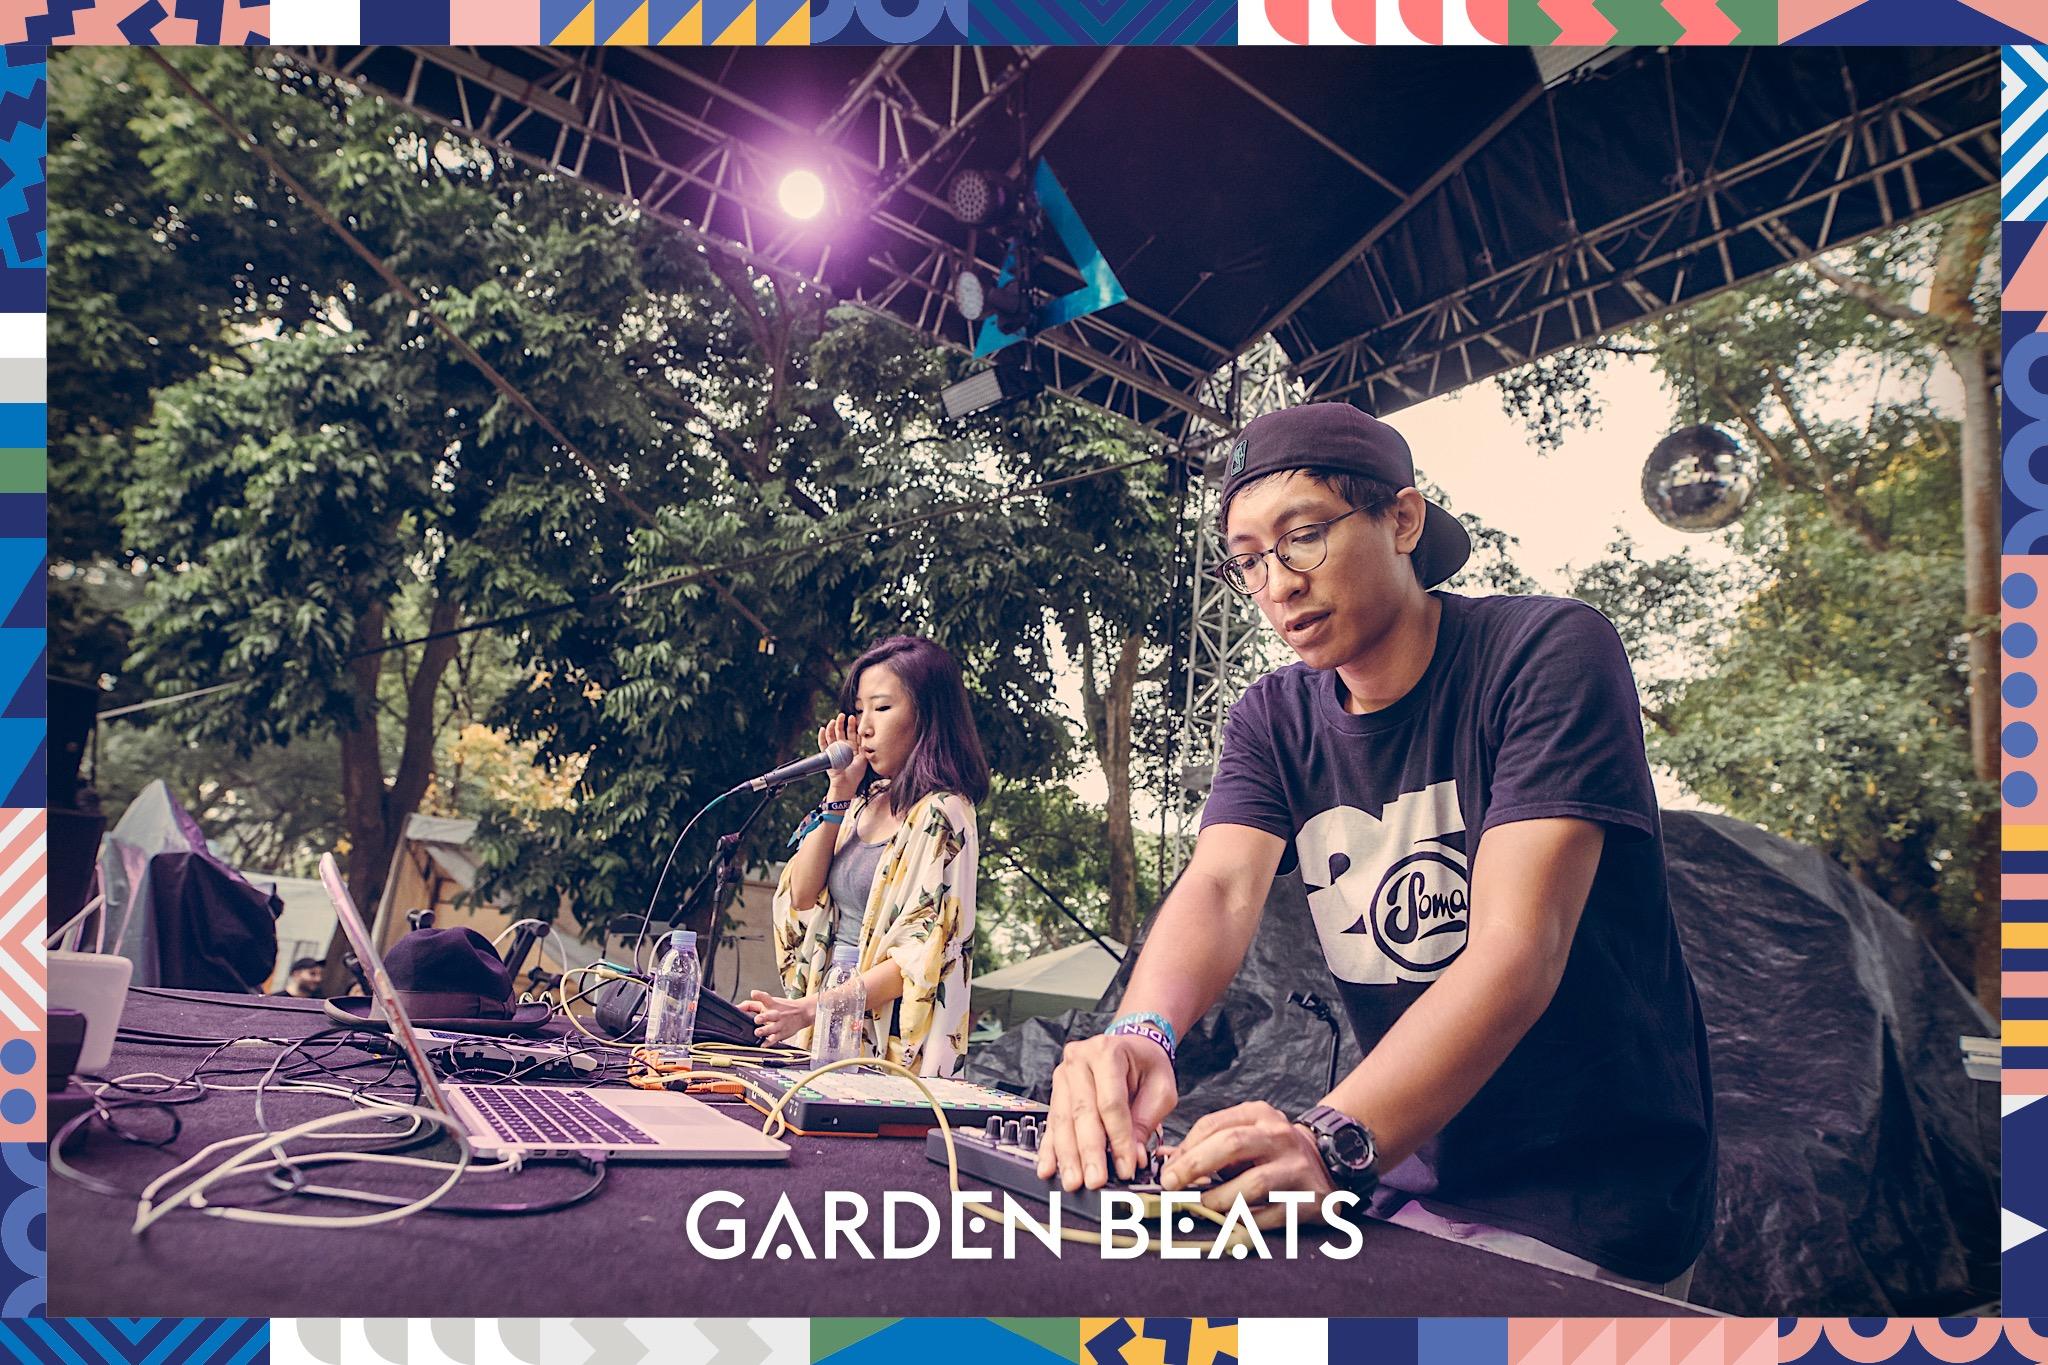 03032018_GardenBeats_Colossal453_Watermarked.jpg